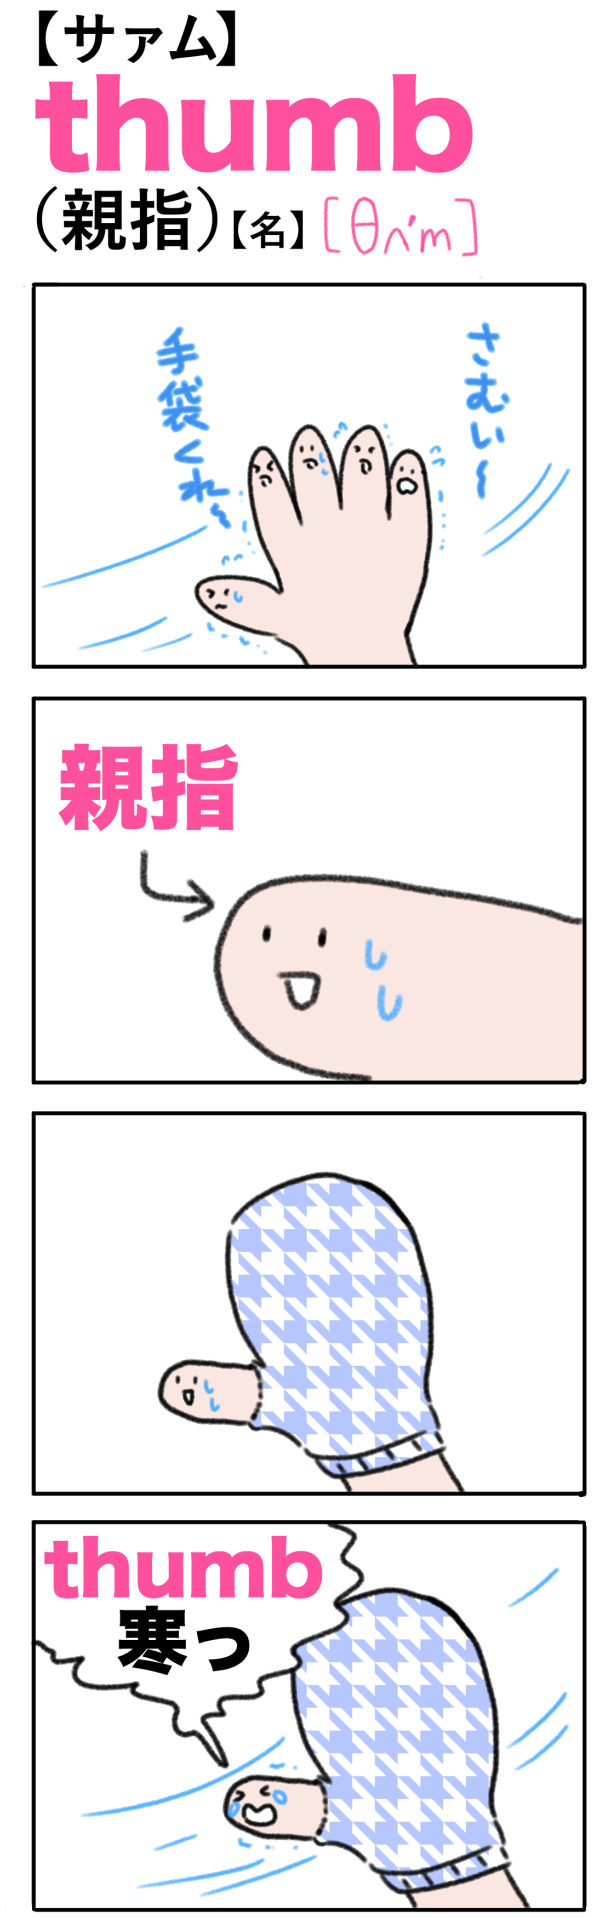 thumb(親指)の語呂合わせ英単語